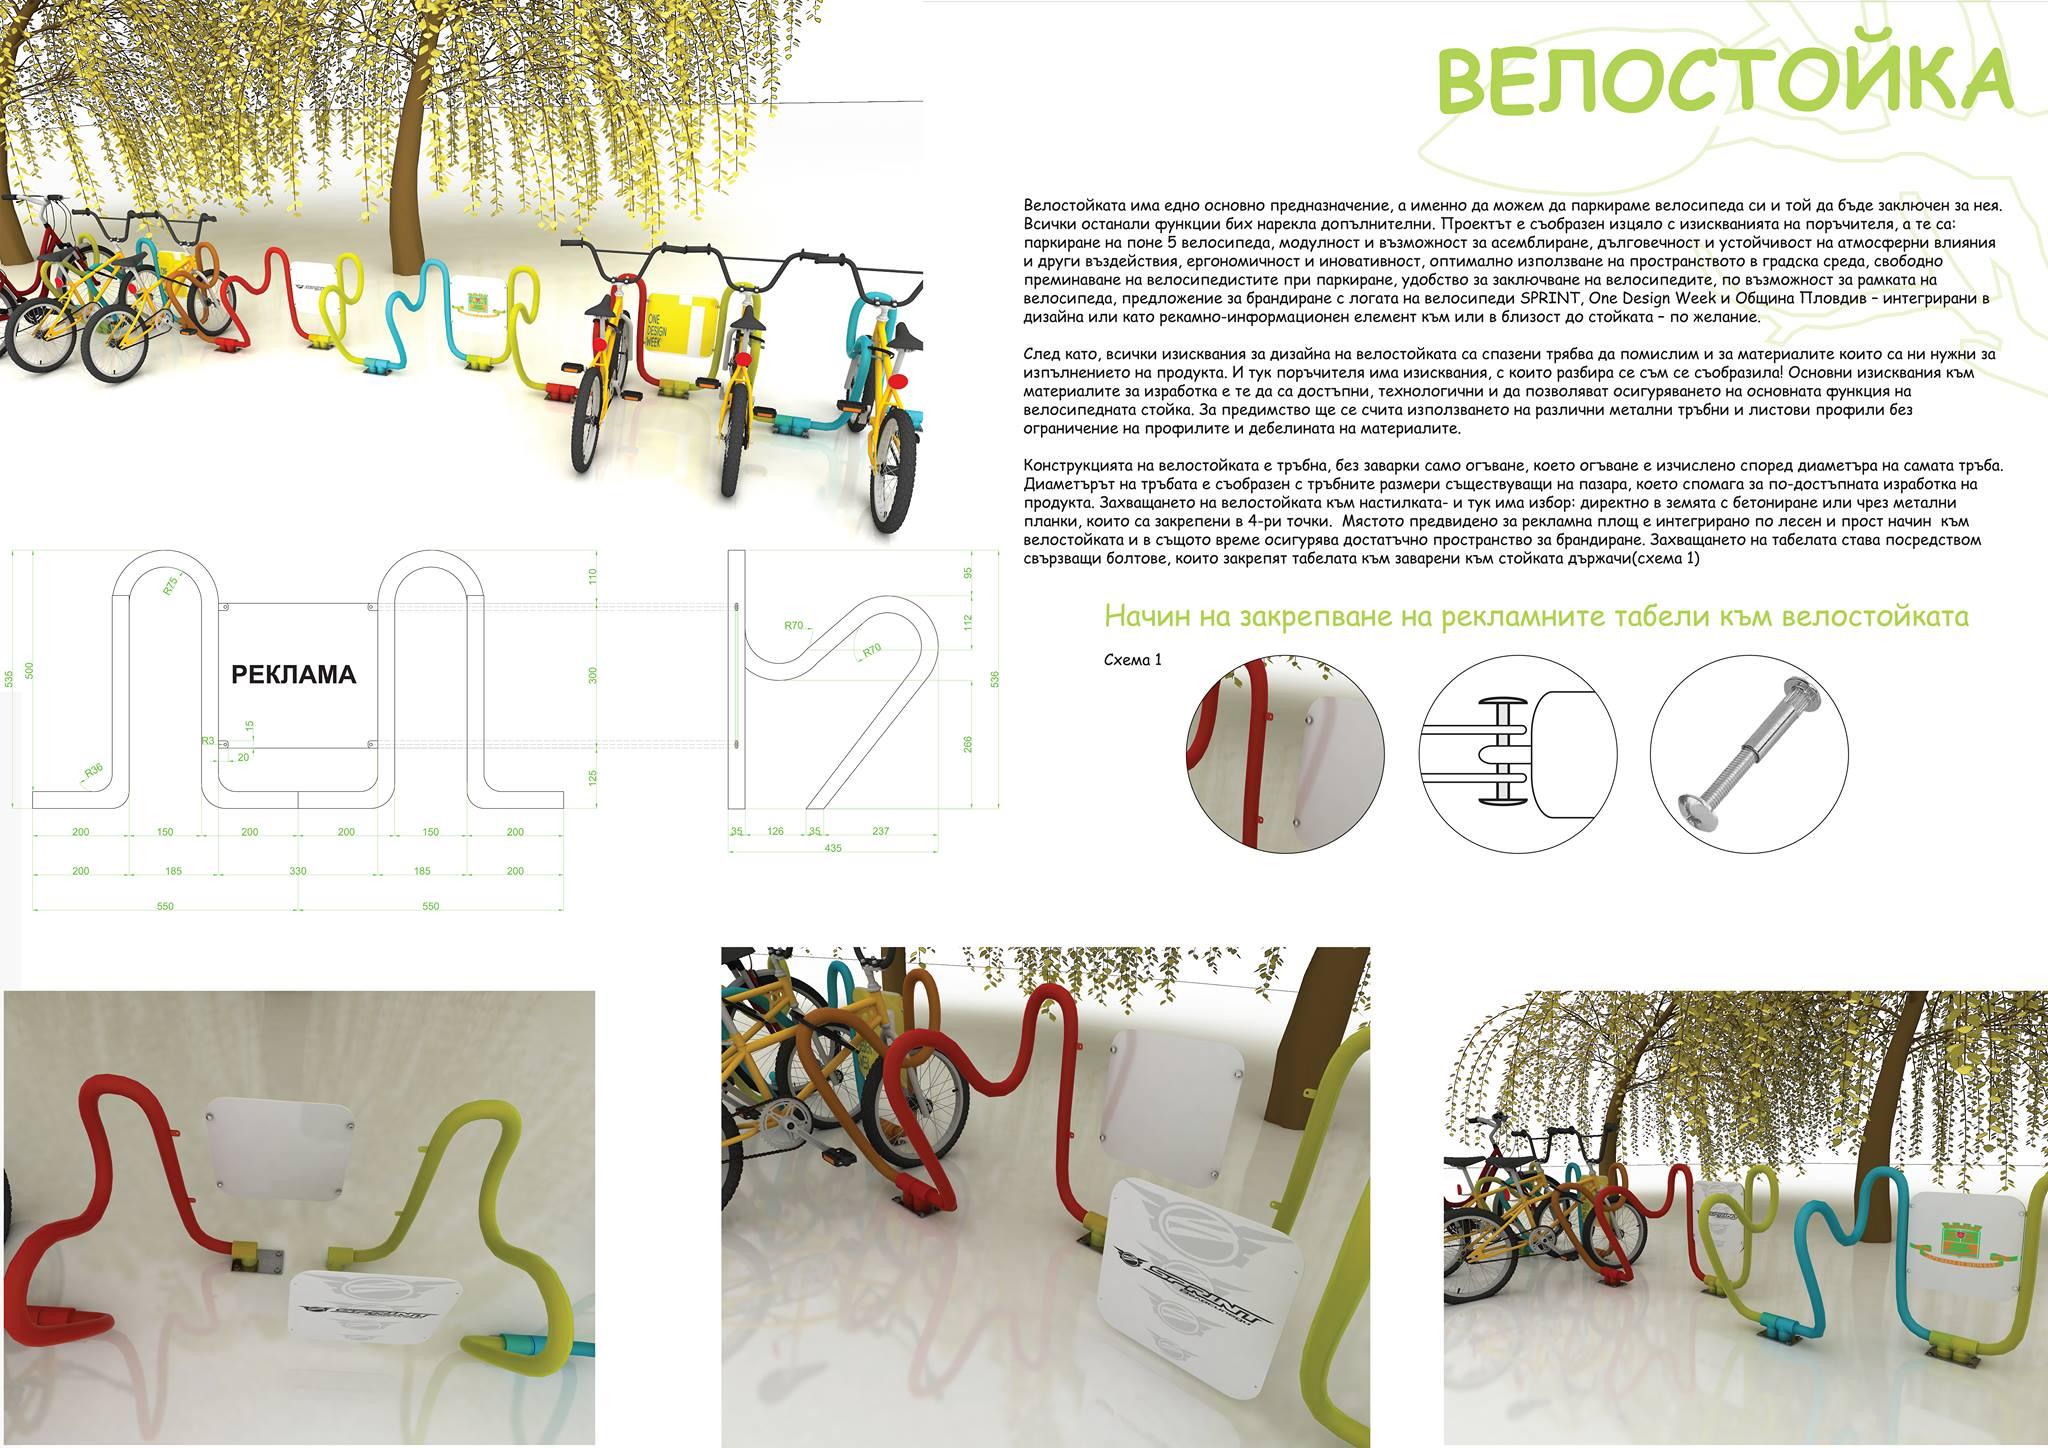 Produktov dizajn - velostojka 3